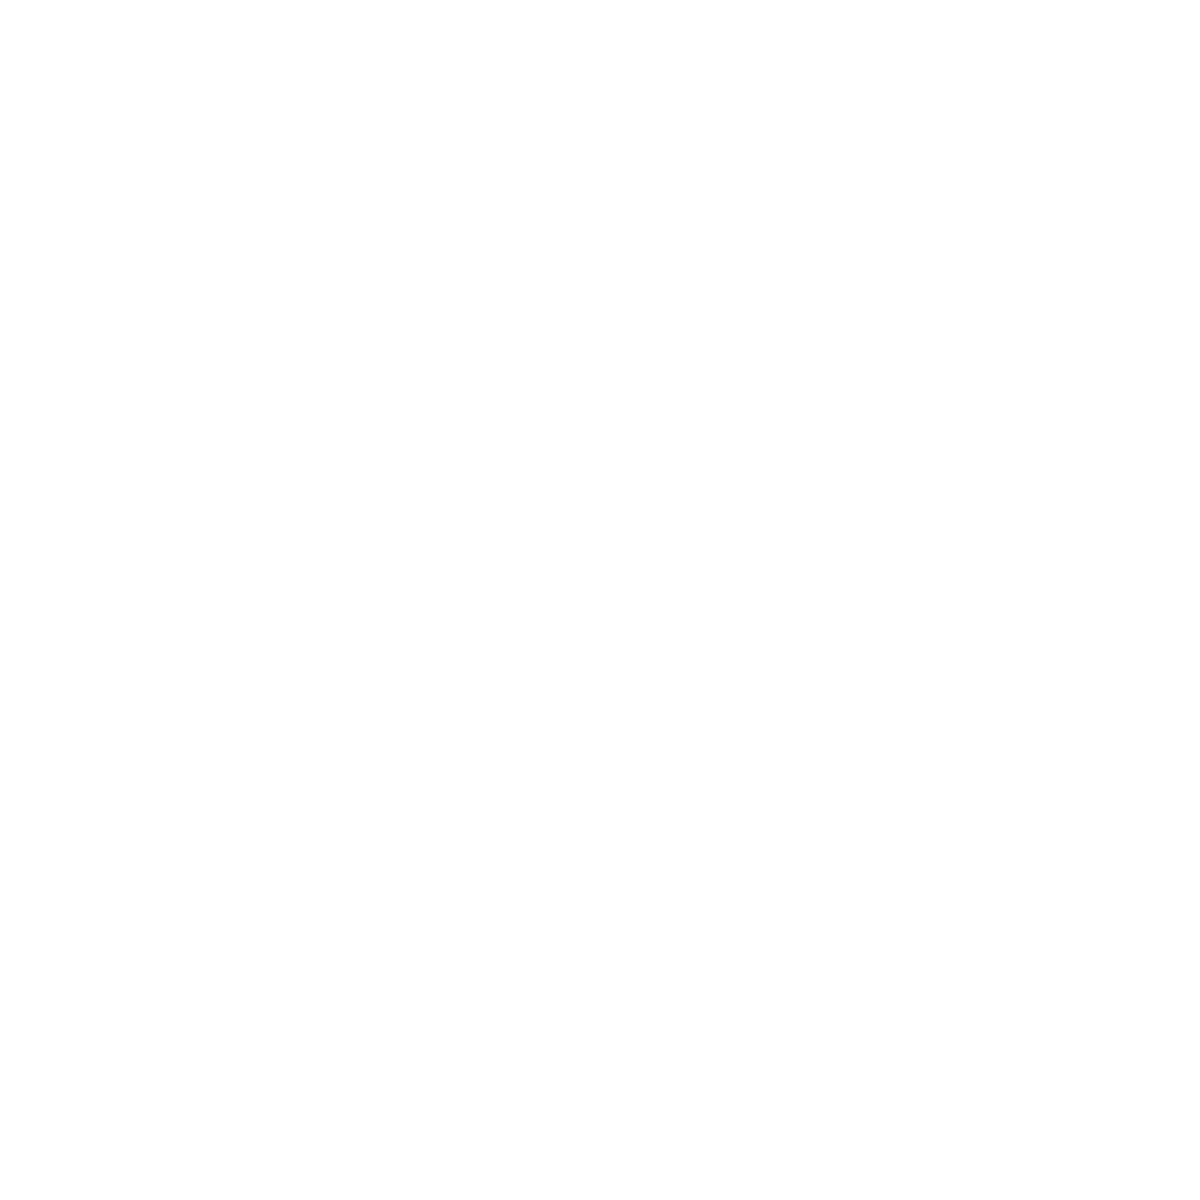 Goli zeni so cicki sliki kazam | Main page | platenavon